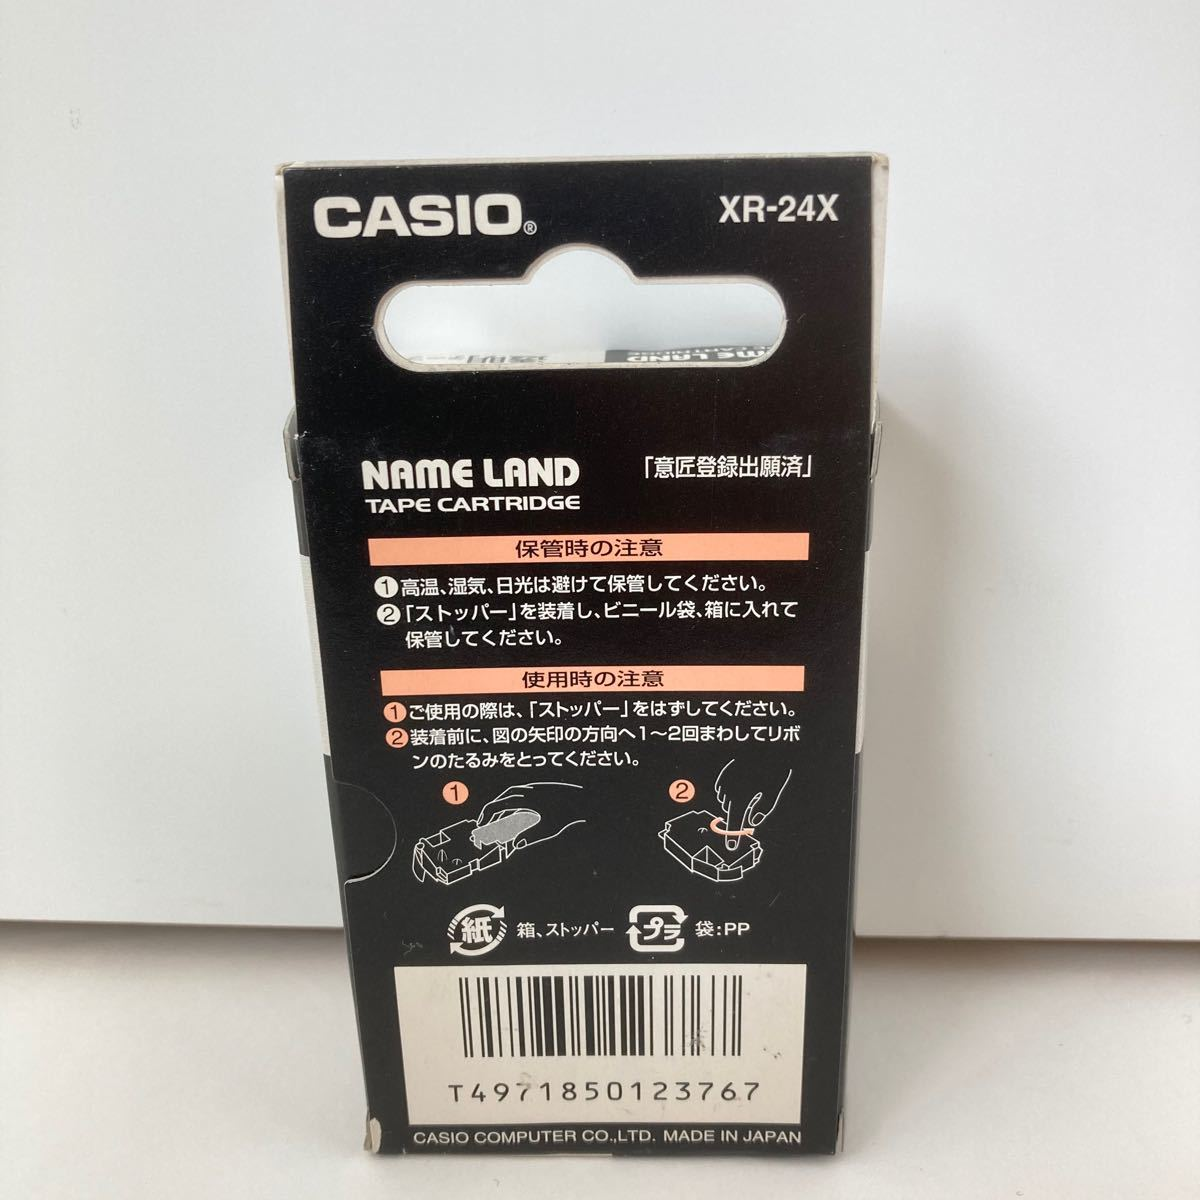 CASIO カシオ ネームランド 純正 テープ 24mm XR-24X 透明に黒文字【新品即出荷、送料込!!】